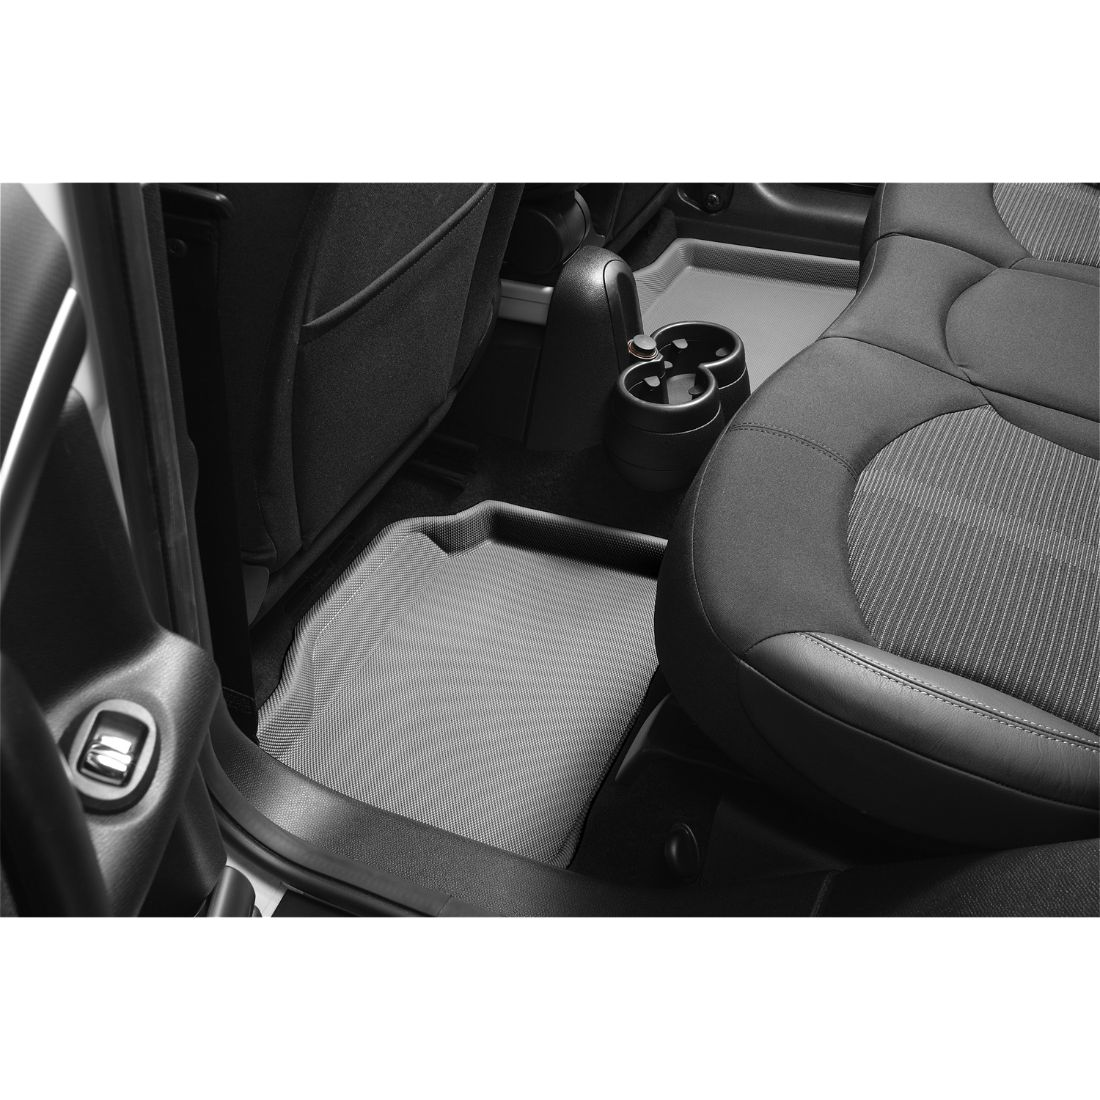 thumbnail 17 - 3D MAXpider Custom Fit KAGU All-Weather Floor Mats for Scion 2013-2015 xB